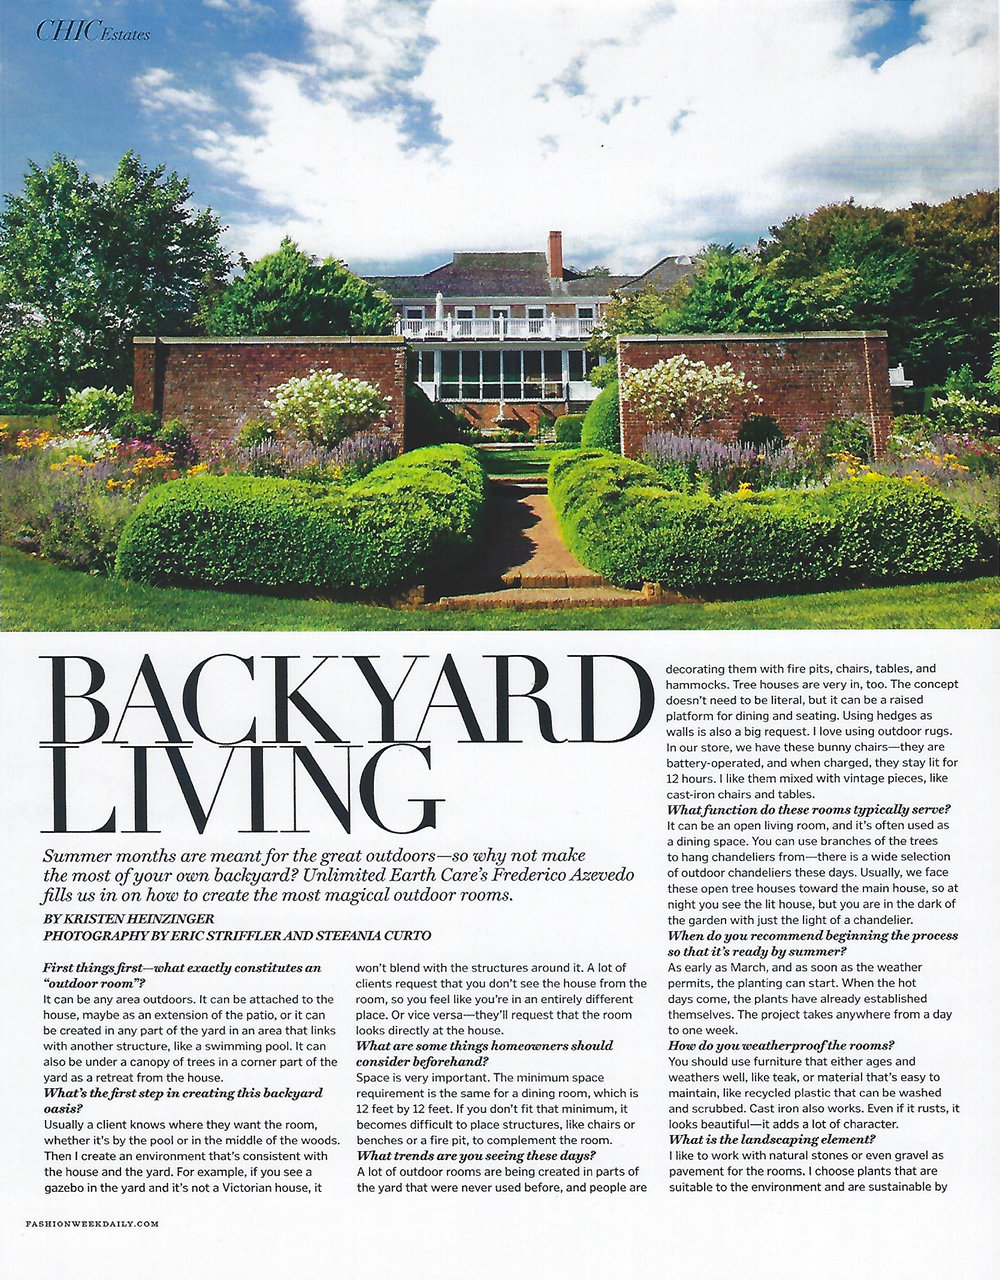 Daily Front Row - Backyard Living_June 2017 1.jpg